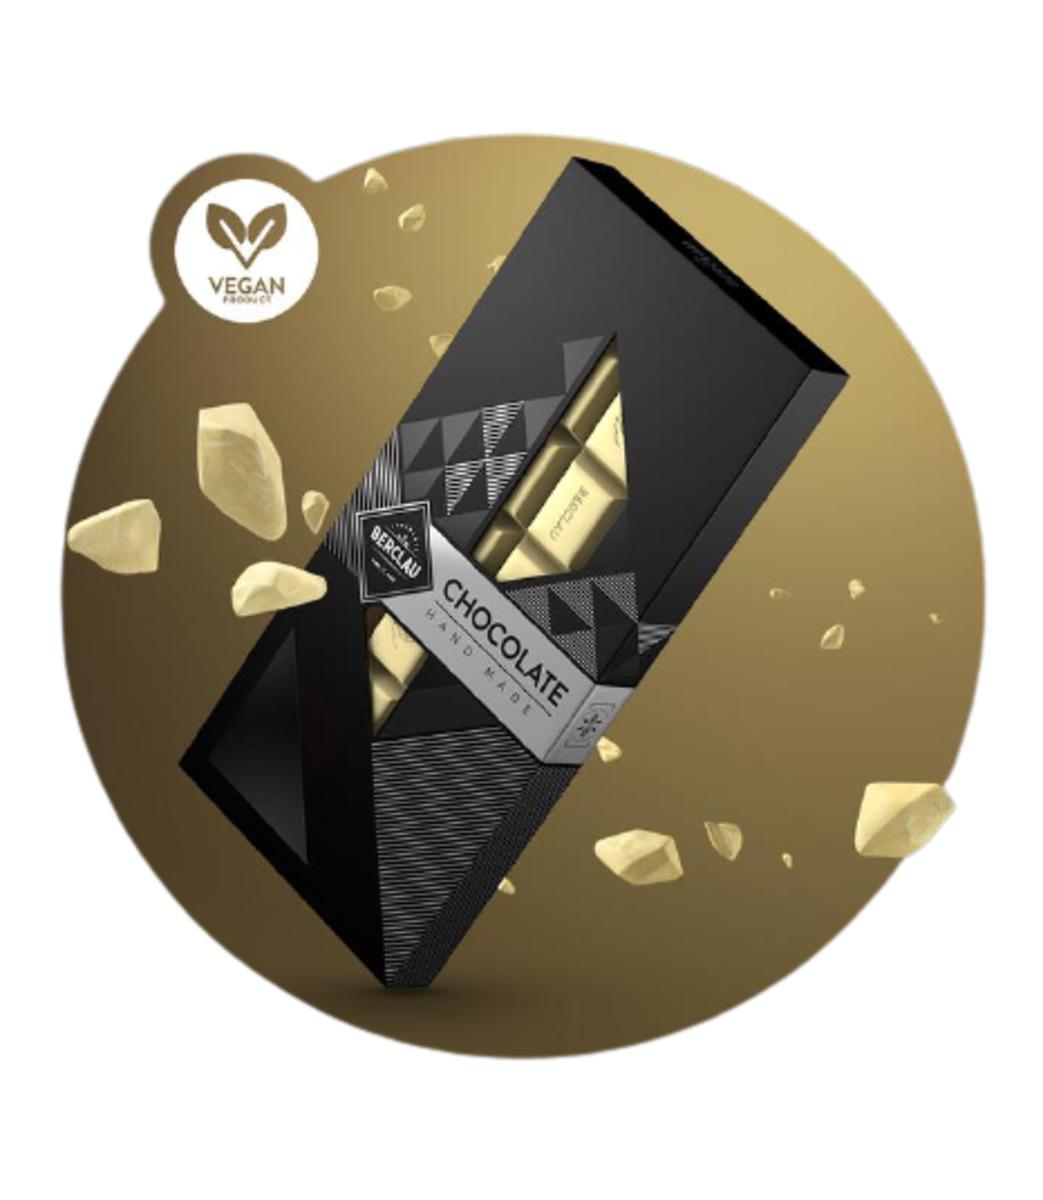 Chocolate Blanco Vegano Berclau